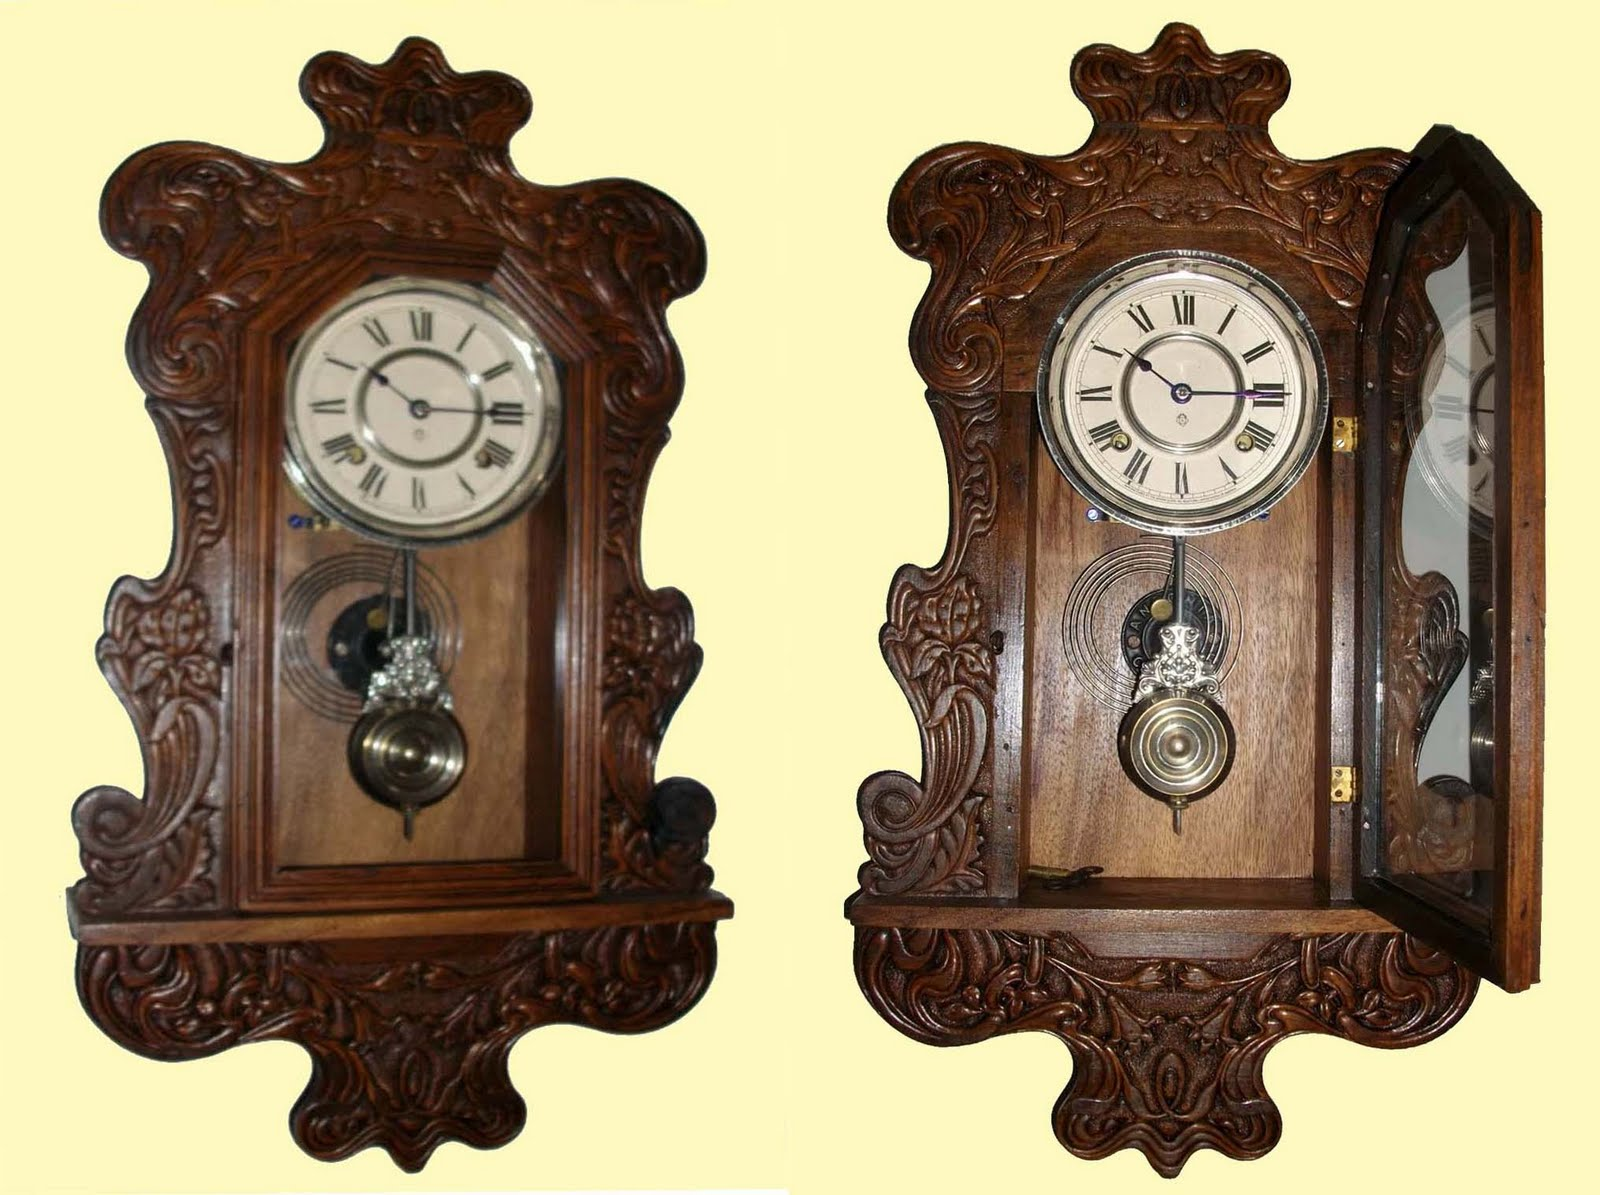 3844796895e PARAENSE RELÓGIOS ANTIGOS  Fotos Relógios Antigos